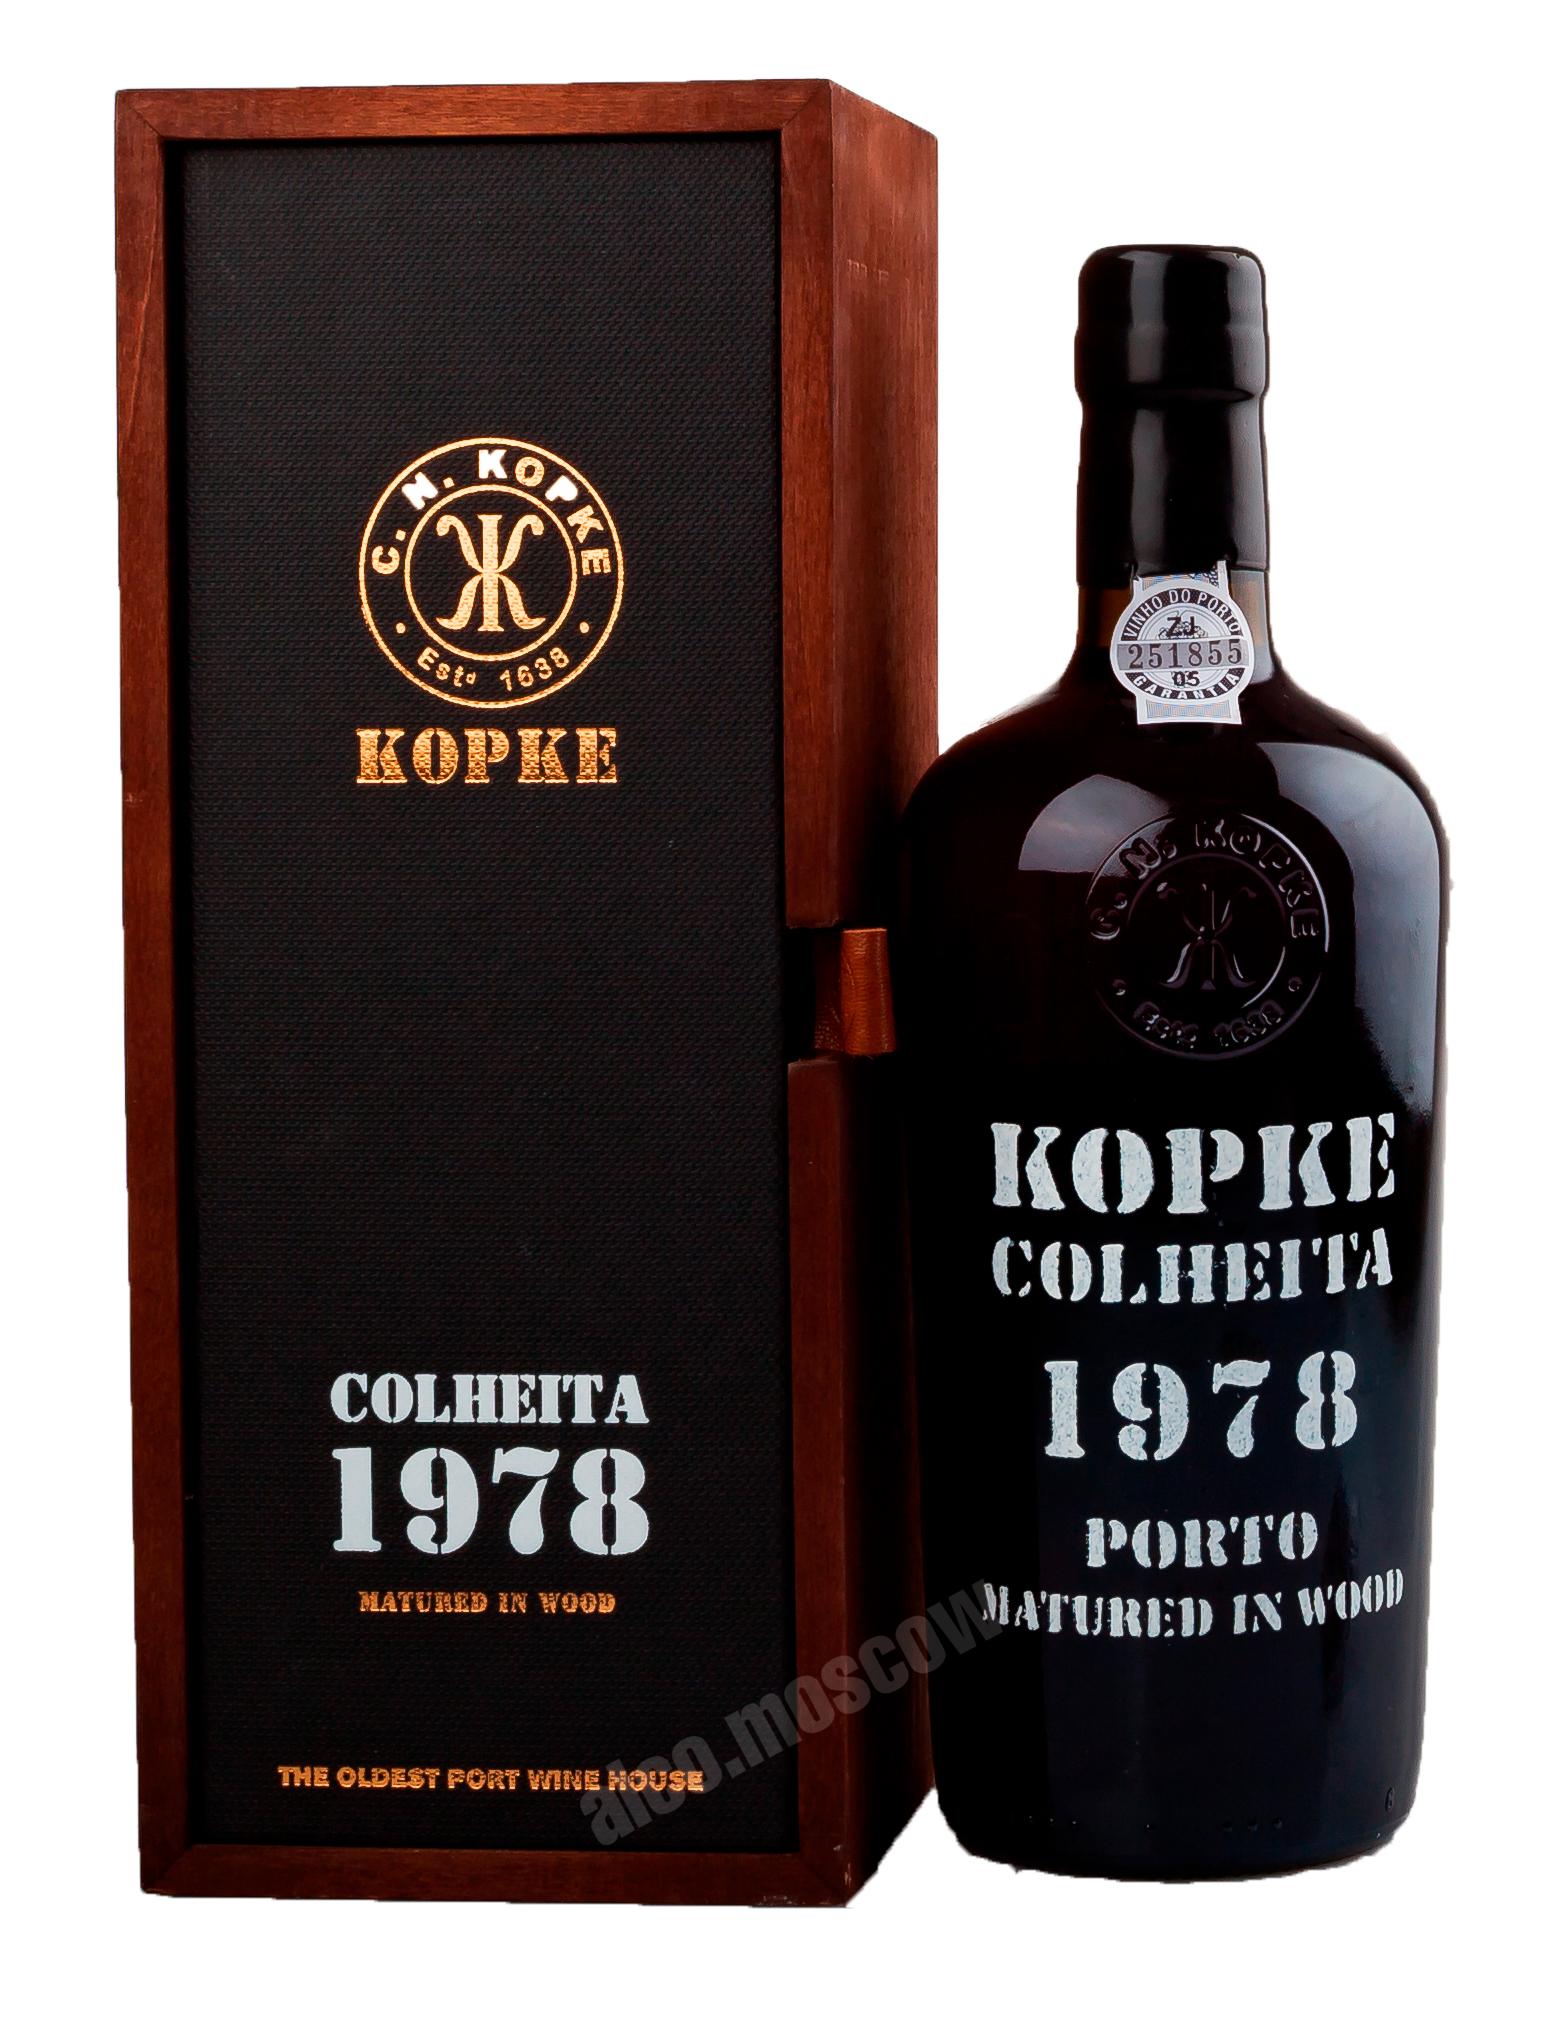 Kopke Porto Kopke Colheita 1978 портвейн Копке Колейта 1978